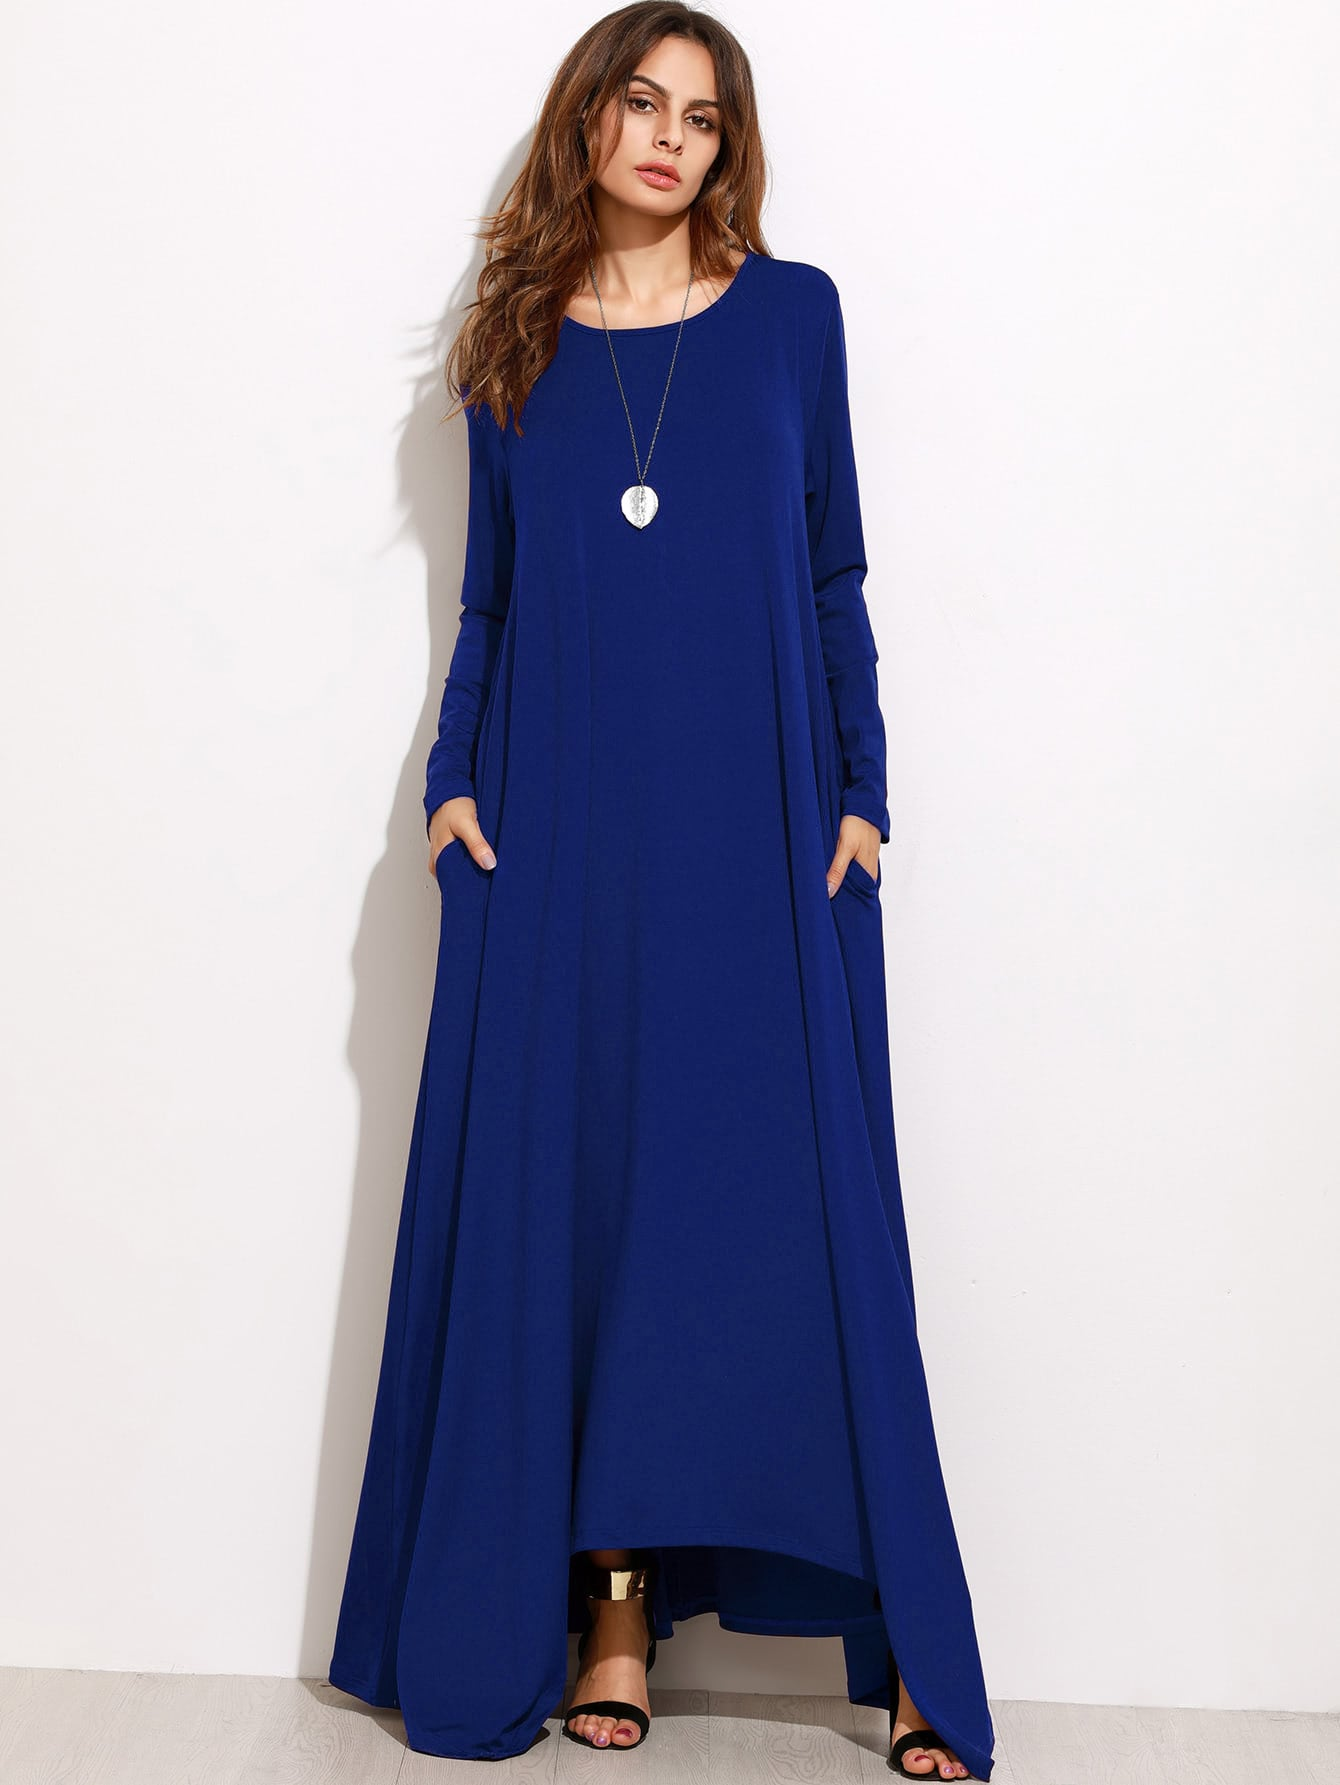 89e023be22 KOZ1.com | Shop for latest women's fashion dresses, tops, bottoms.